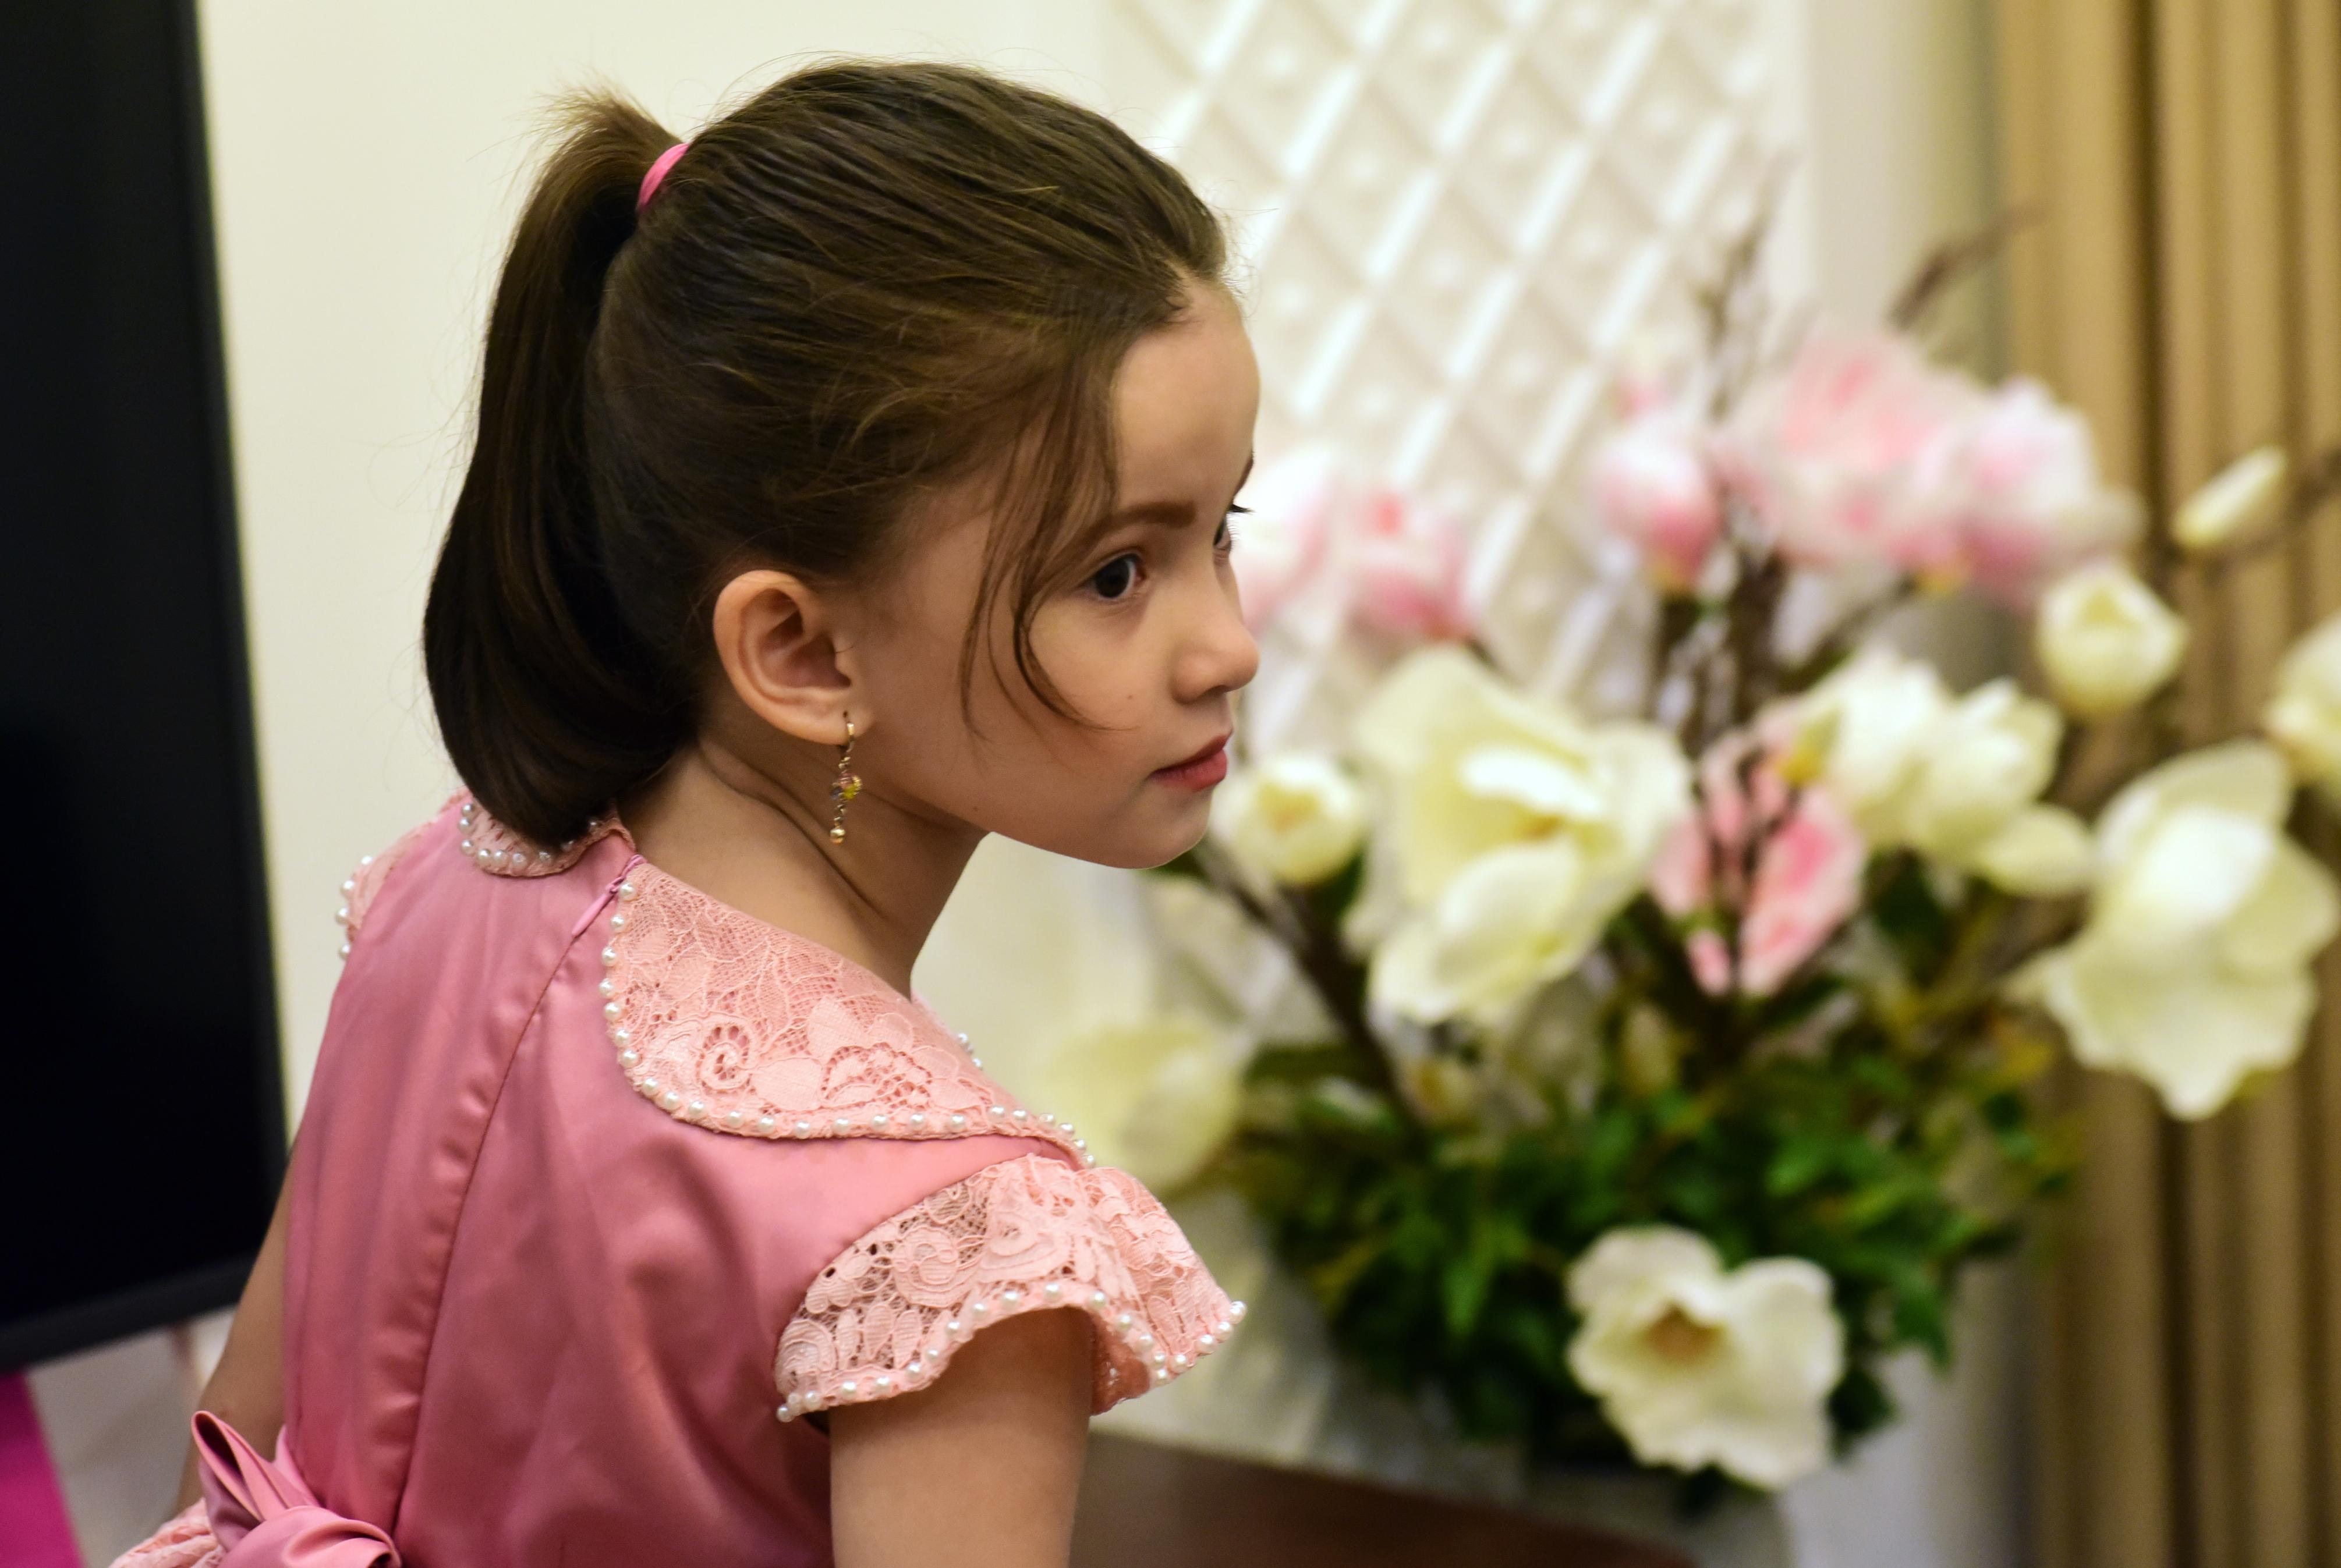 Little Filipino girl wins netizens' heart with cute Vietnamese translation